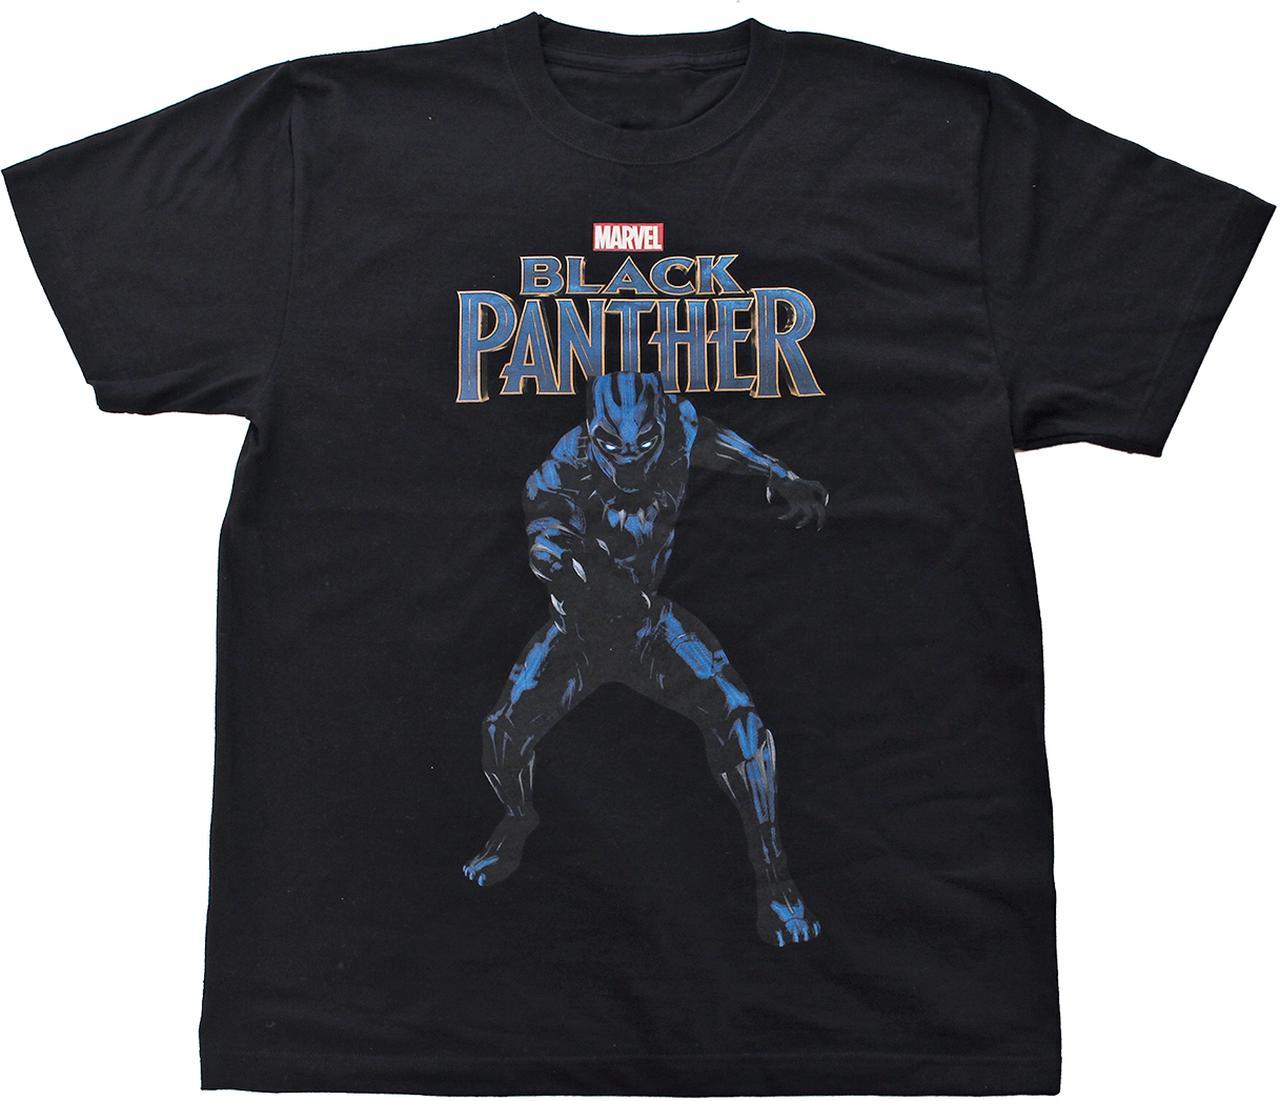 Images : 【MARVEL】 ブラックパンサー 半袖Tシャツ